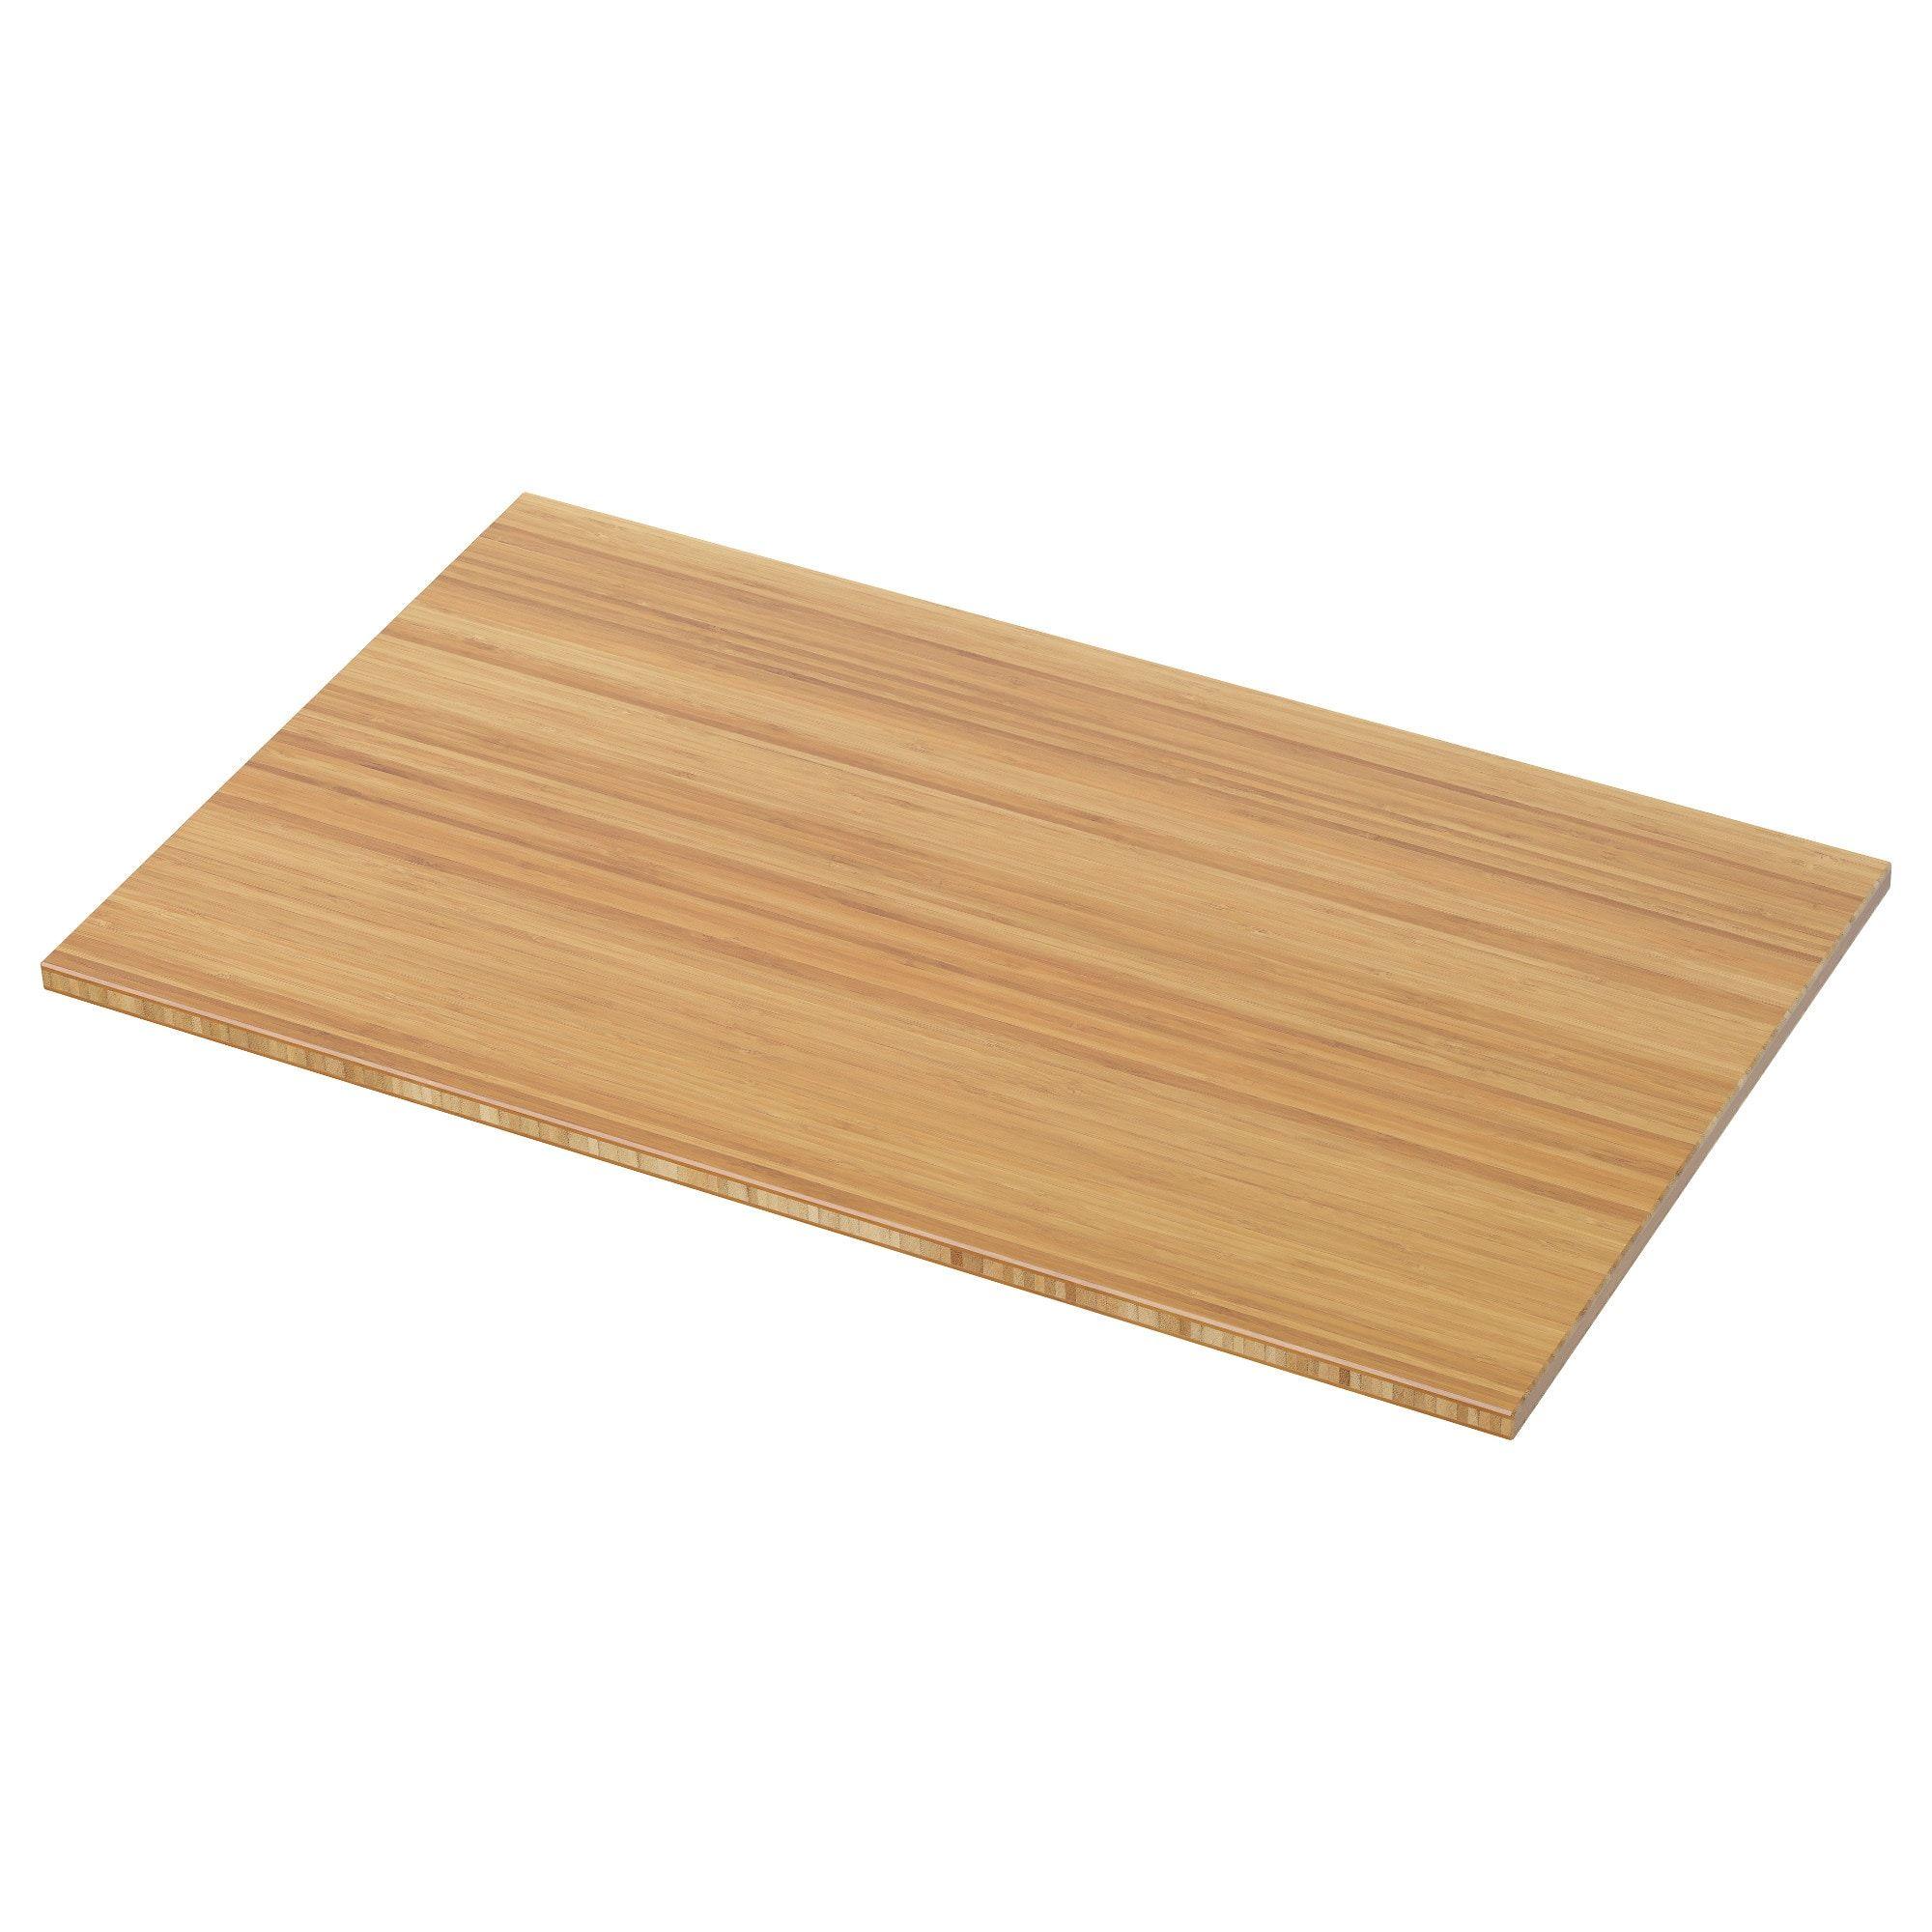 Ikea Tolken Bamboo Countertop Countertops Ikea Wash Stand